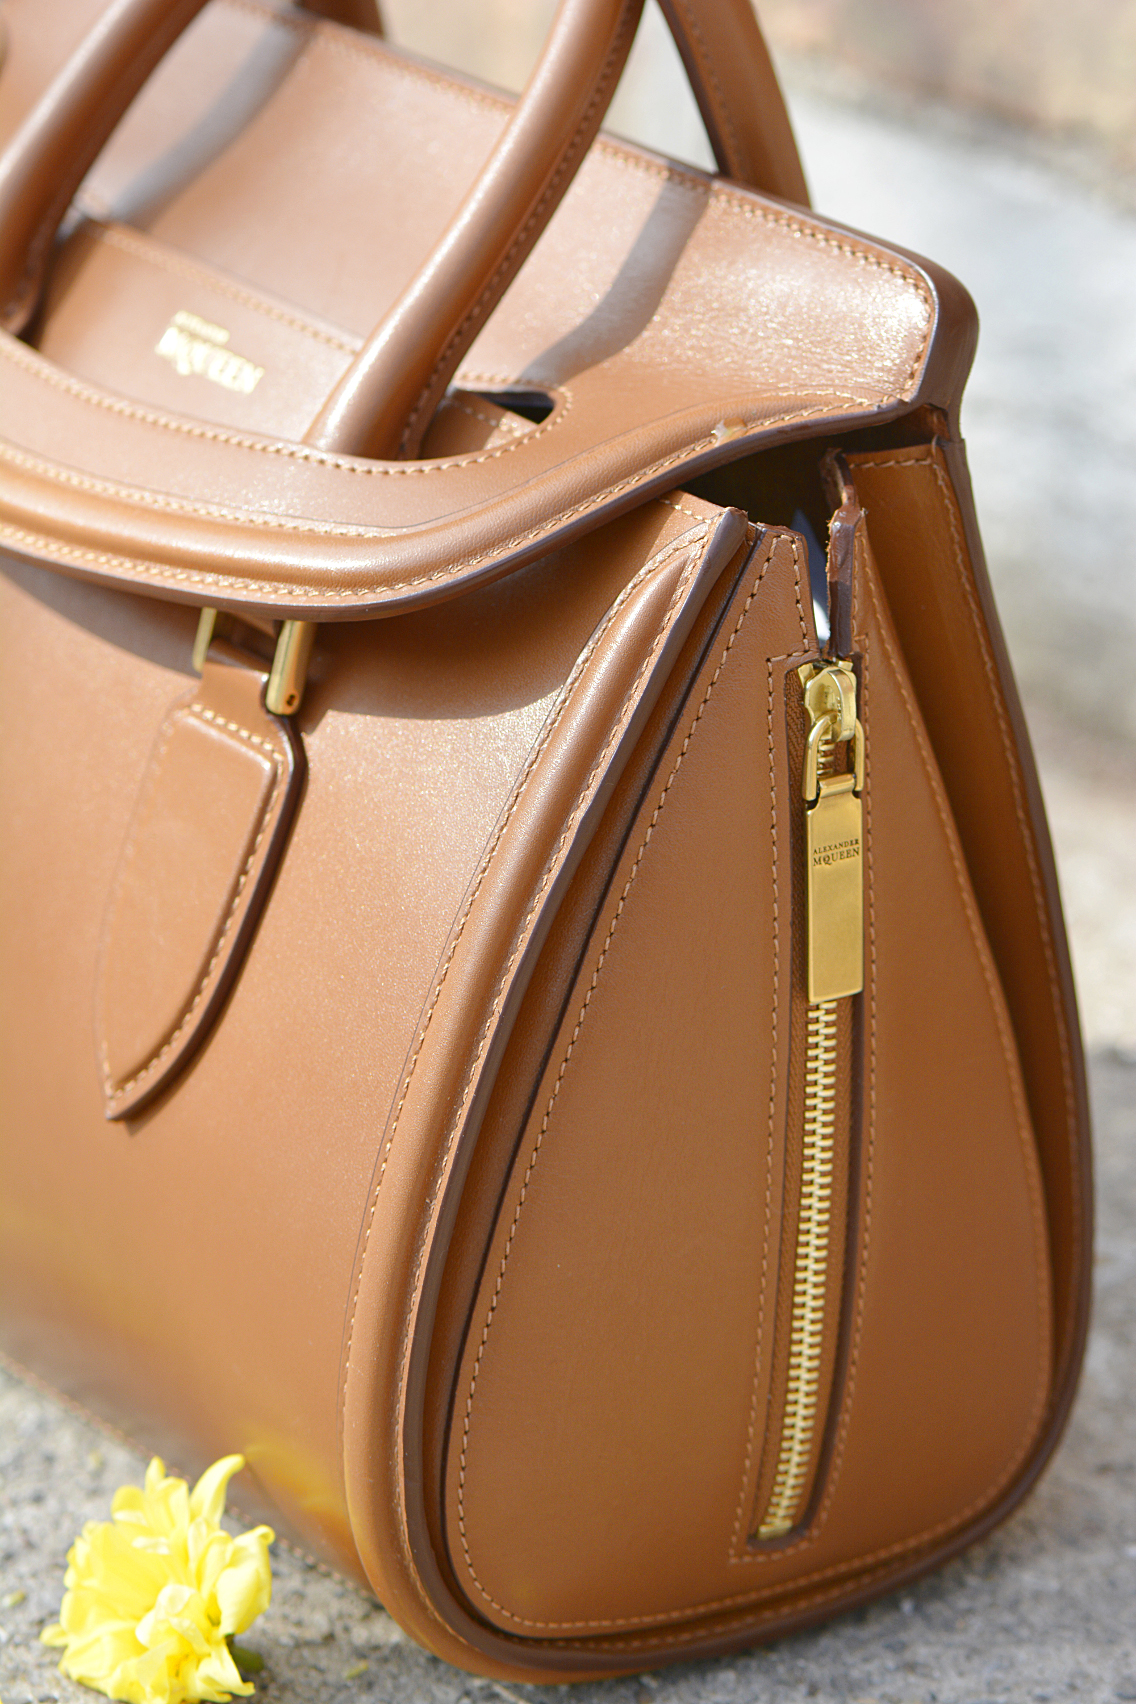 Alexander McQueen Small Heroine Bag Purse in Burnt Camel 15